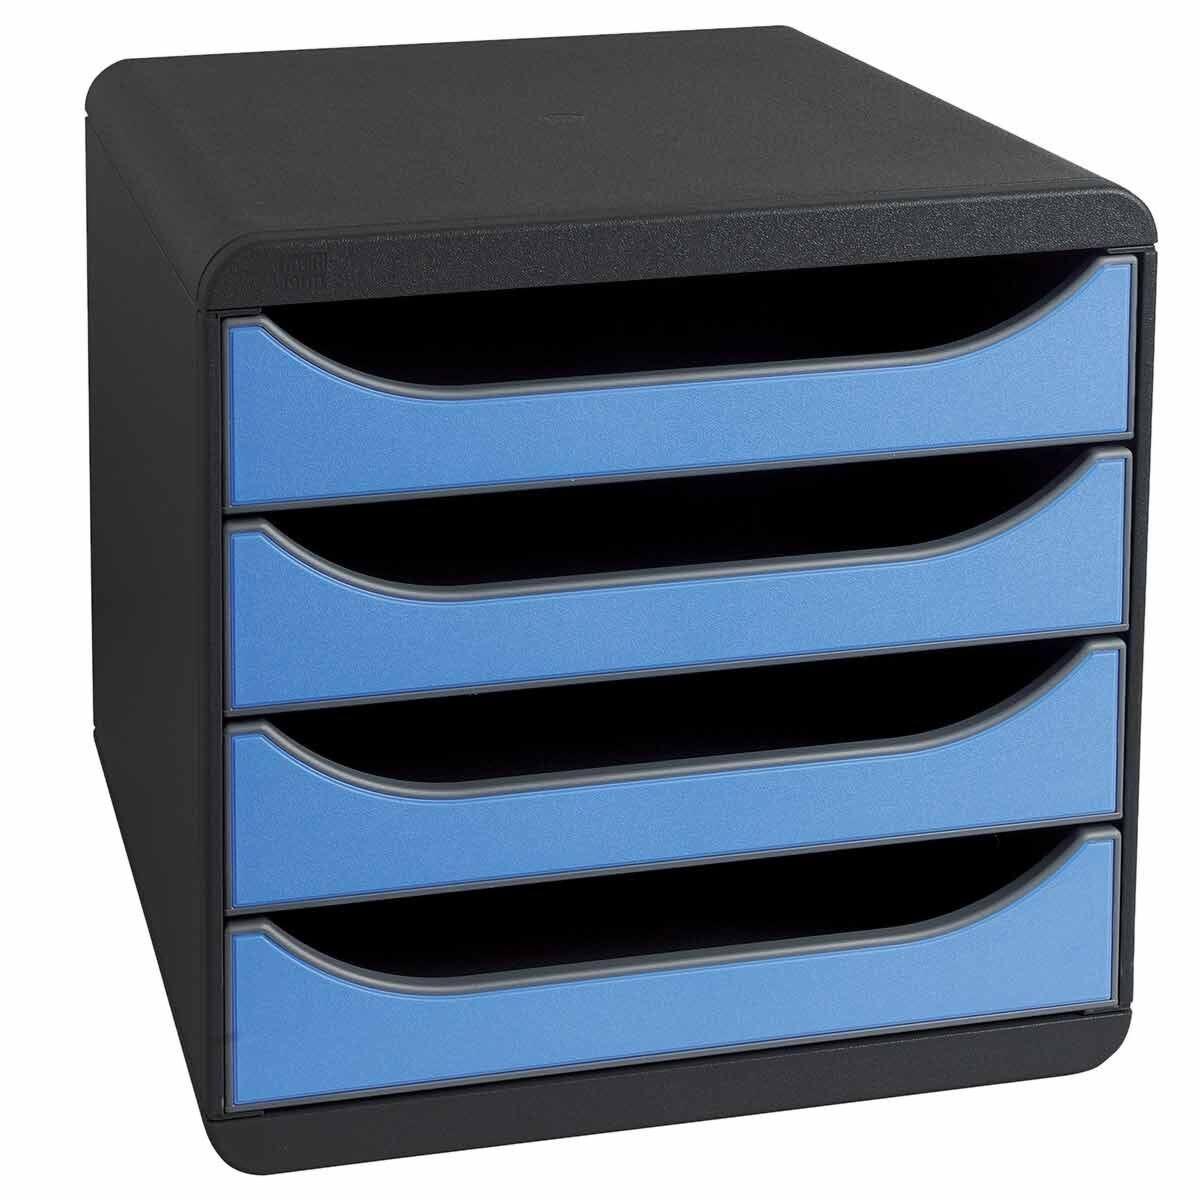 Exacompta BIG-BOX Iderama 4 Drawer Unit Ice Blue